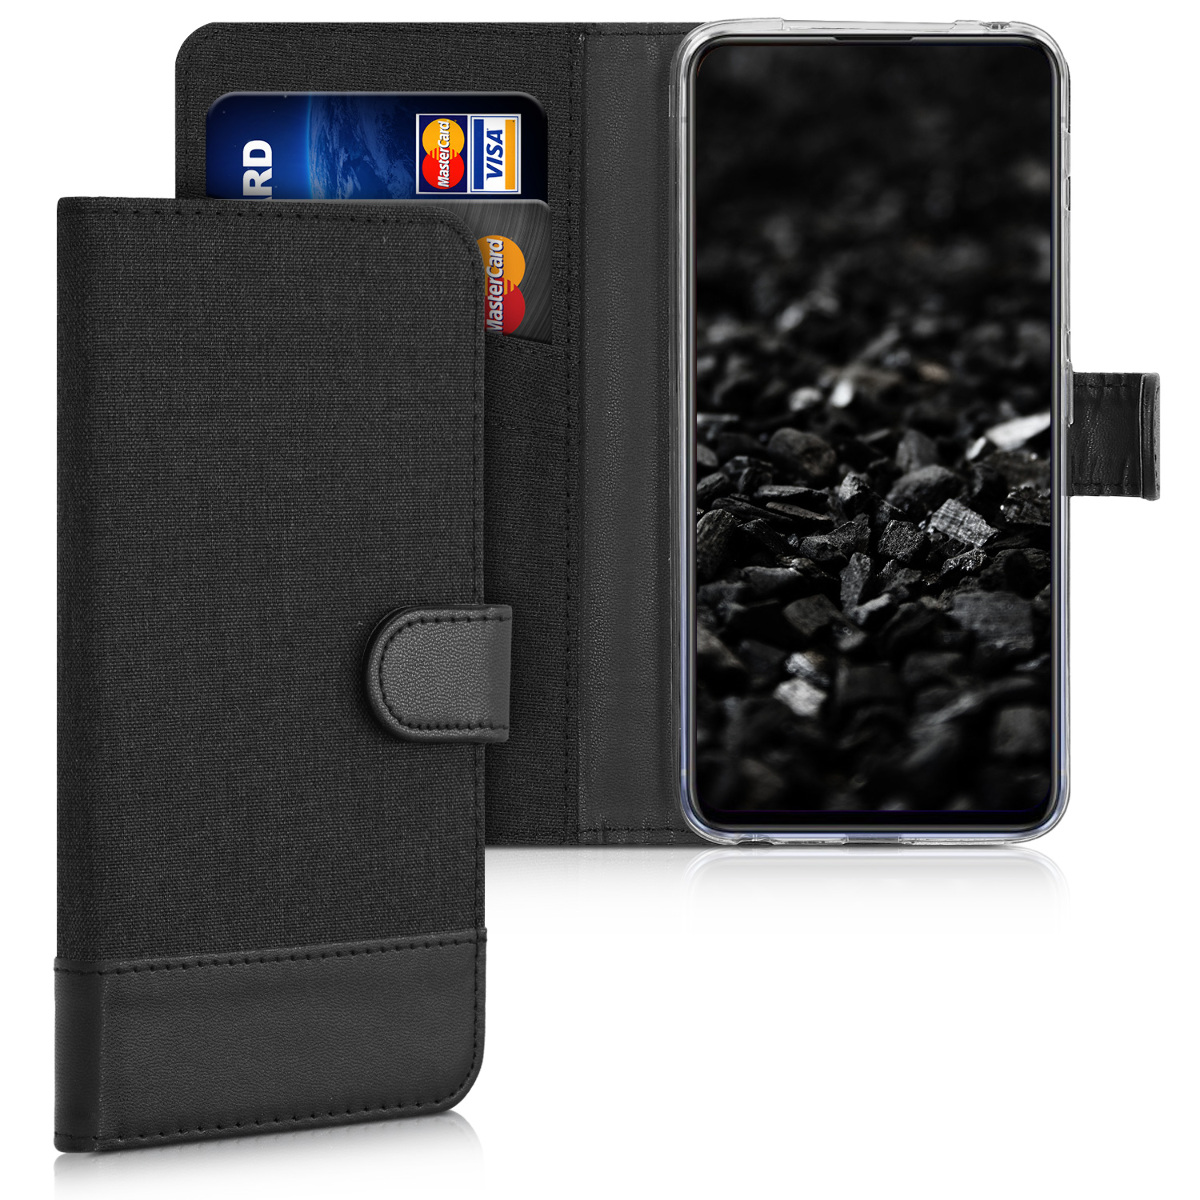 KW Θήκη - Πορτοφόλι Motorola One Macro - Fabric and PU Leather Flip Cover - Anthracite / Black (50672.01)